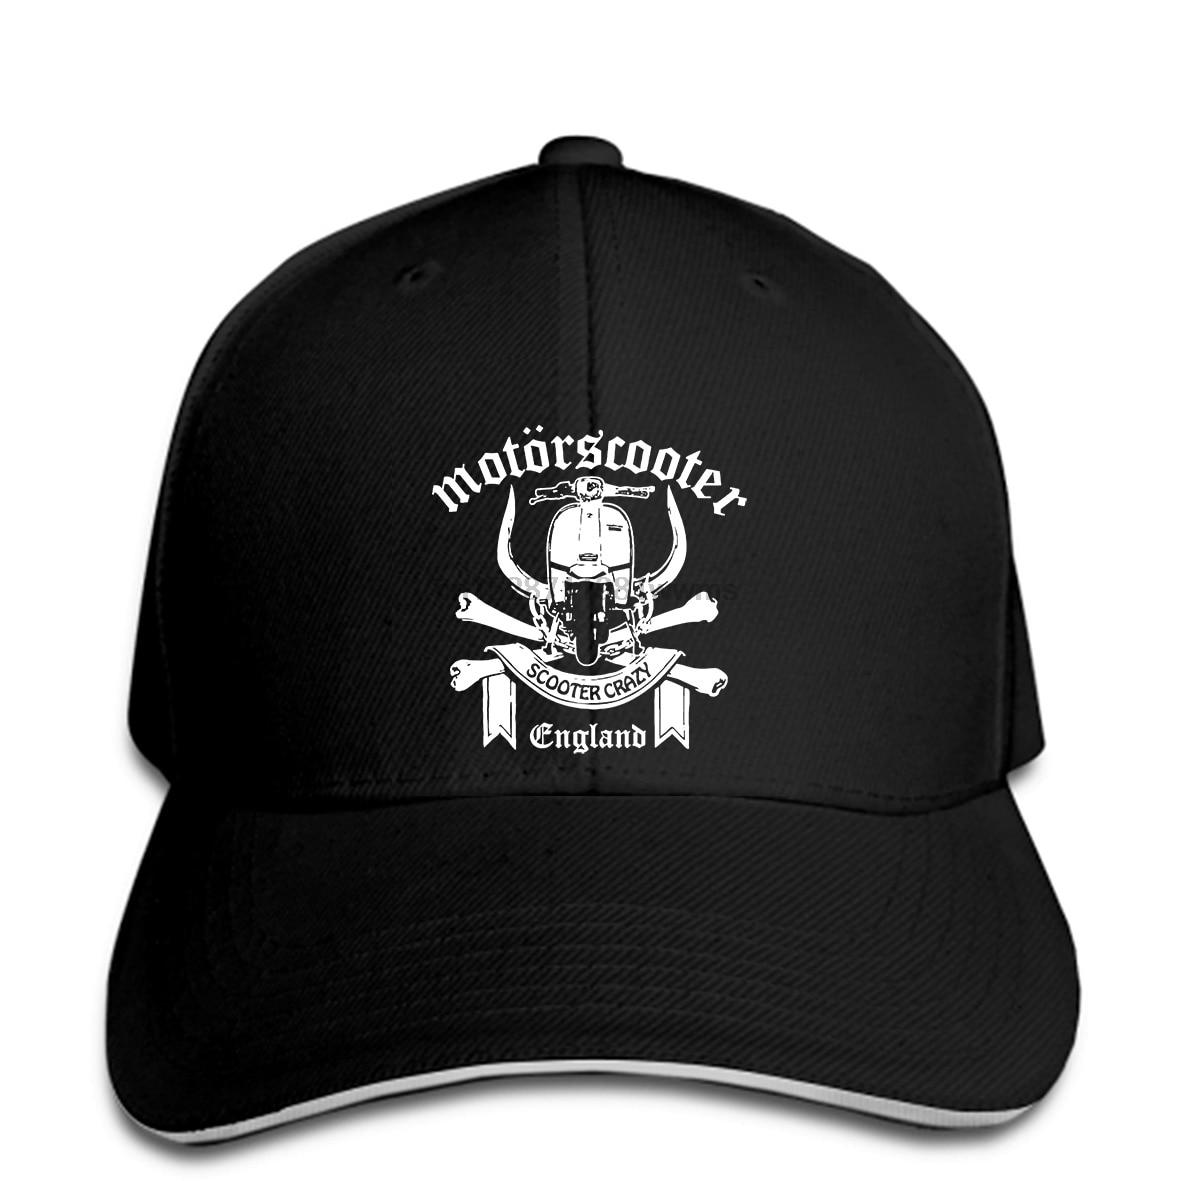 New Brand Baseball cap MOTOR STYLE MOTORSCOOTER Baseball cap SCOOTER BOYS MODS SKINS Summer Fashion snapback hat Peaked